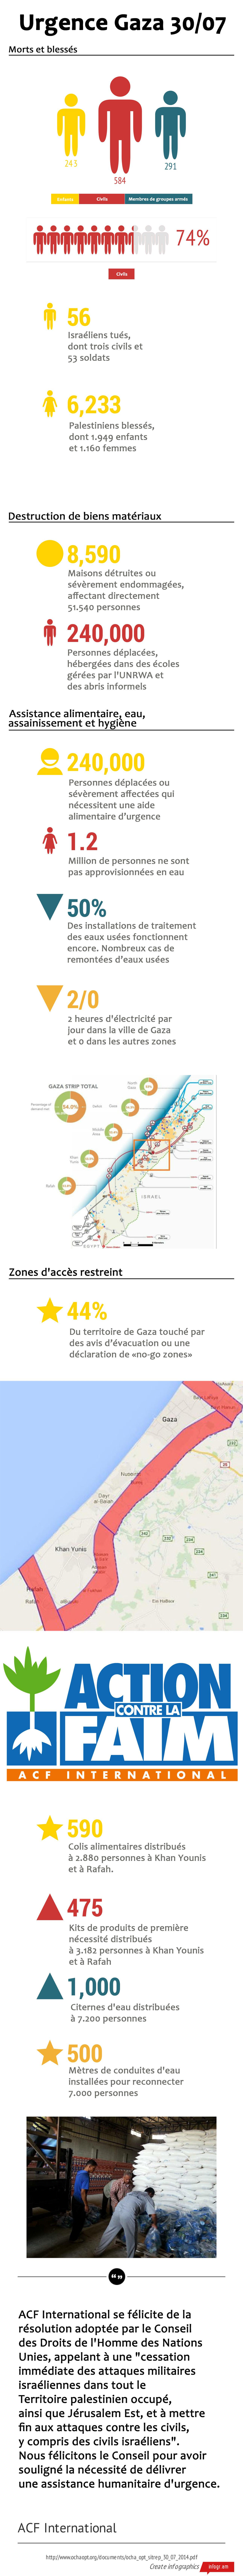 gaza 30 juille2t